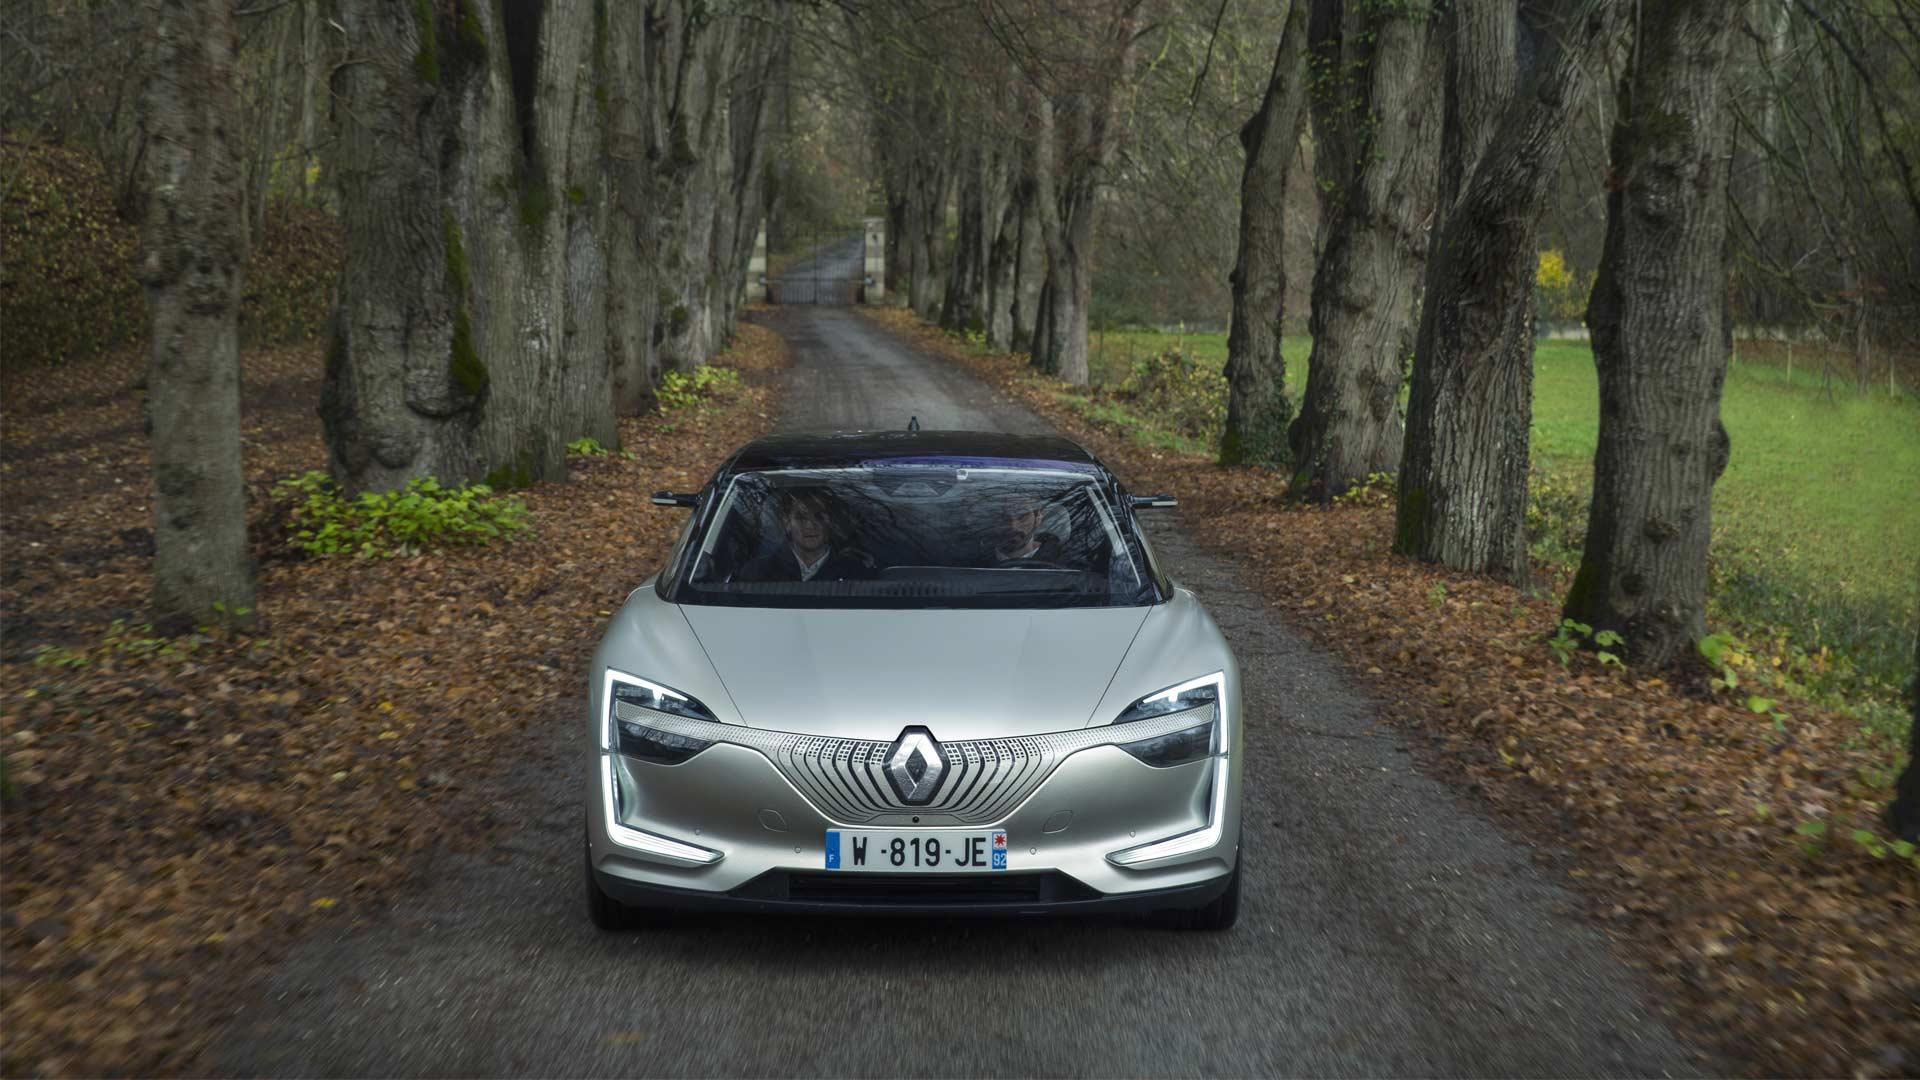 Renault-SYMBIOZ-Demo-Car_5